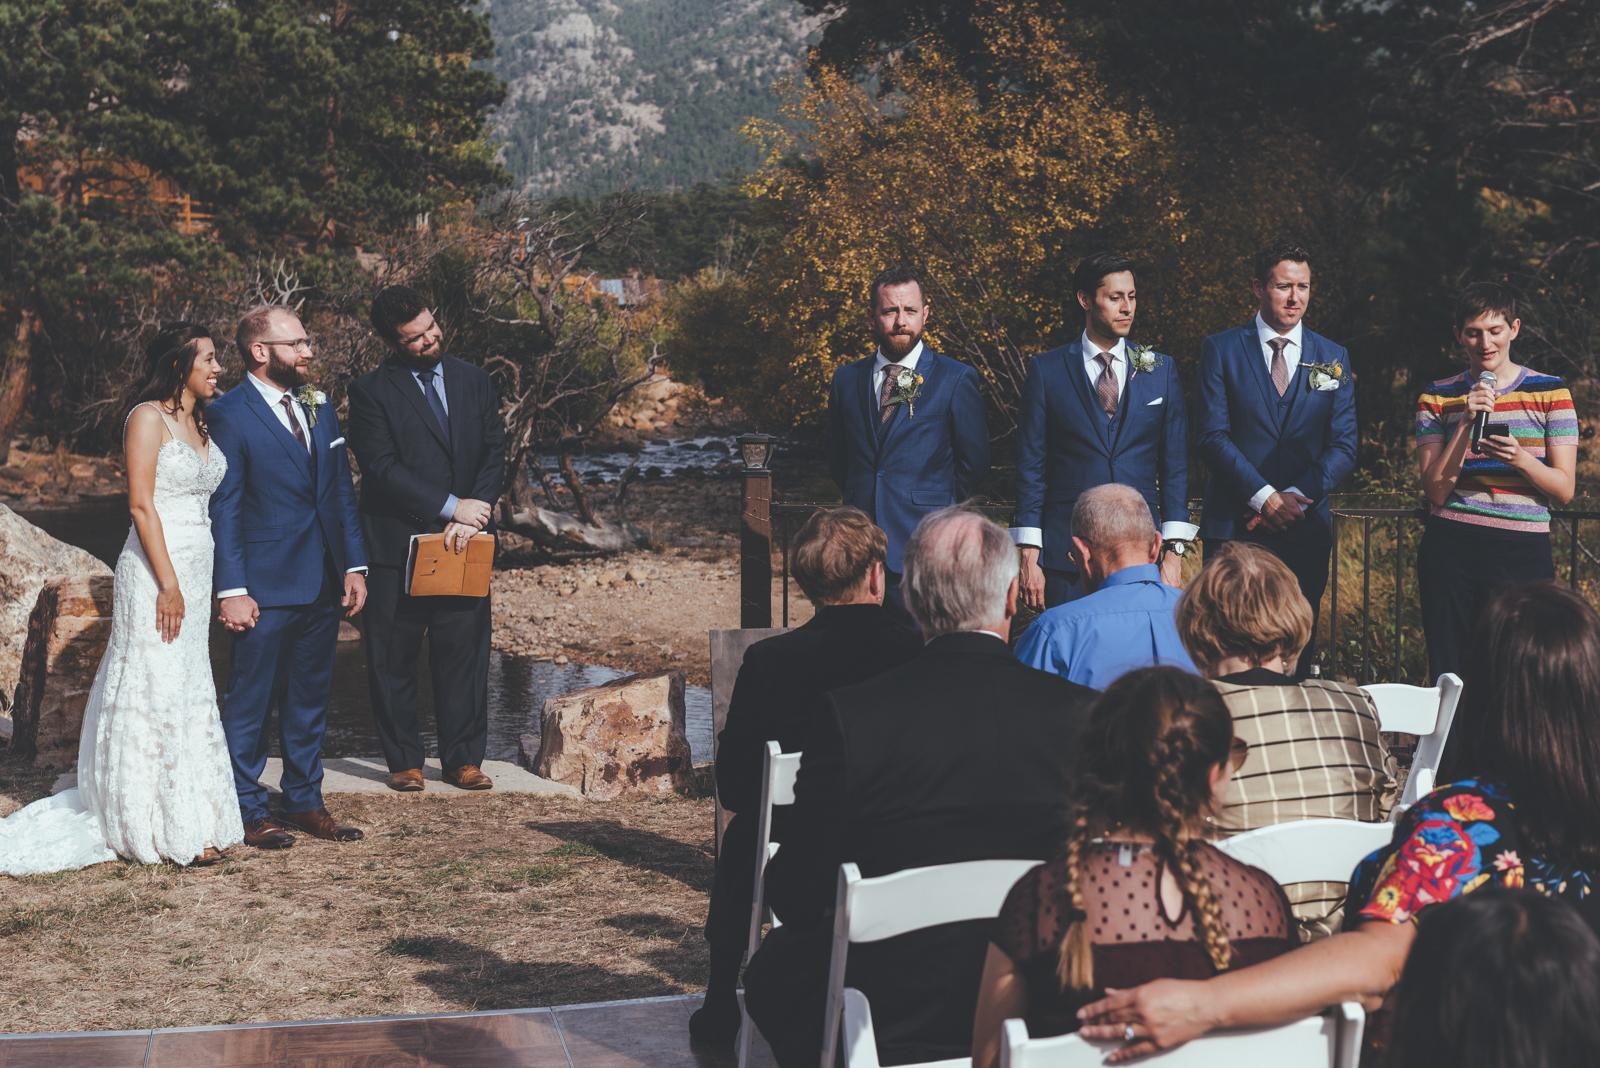 ChadFahnestockPhotography-estes-park-wedding-photography-025.jpg